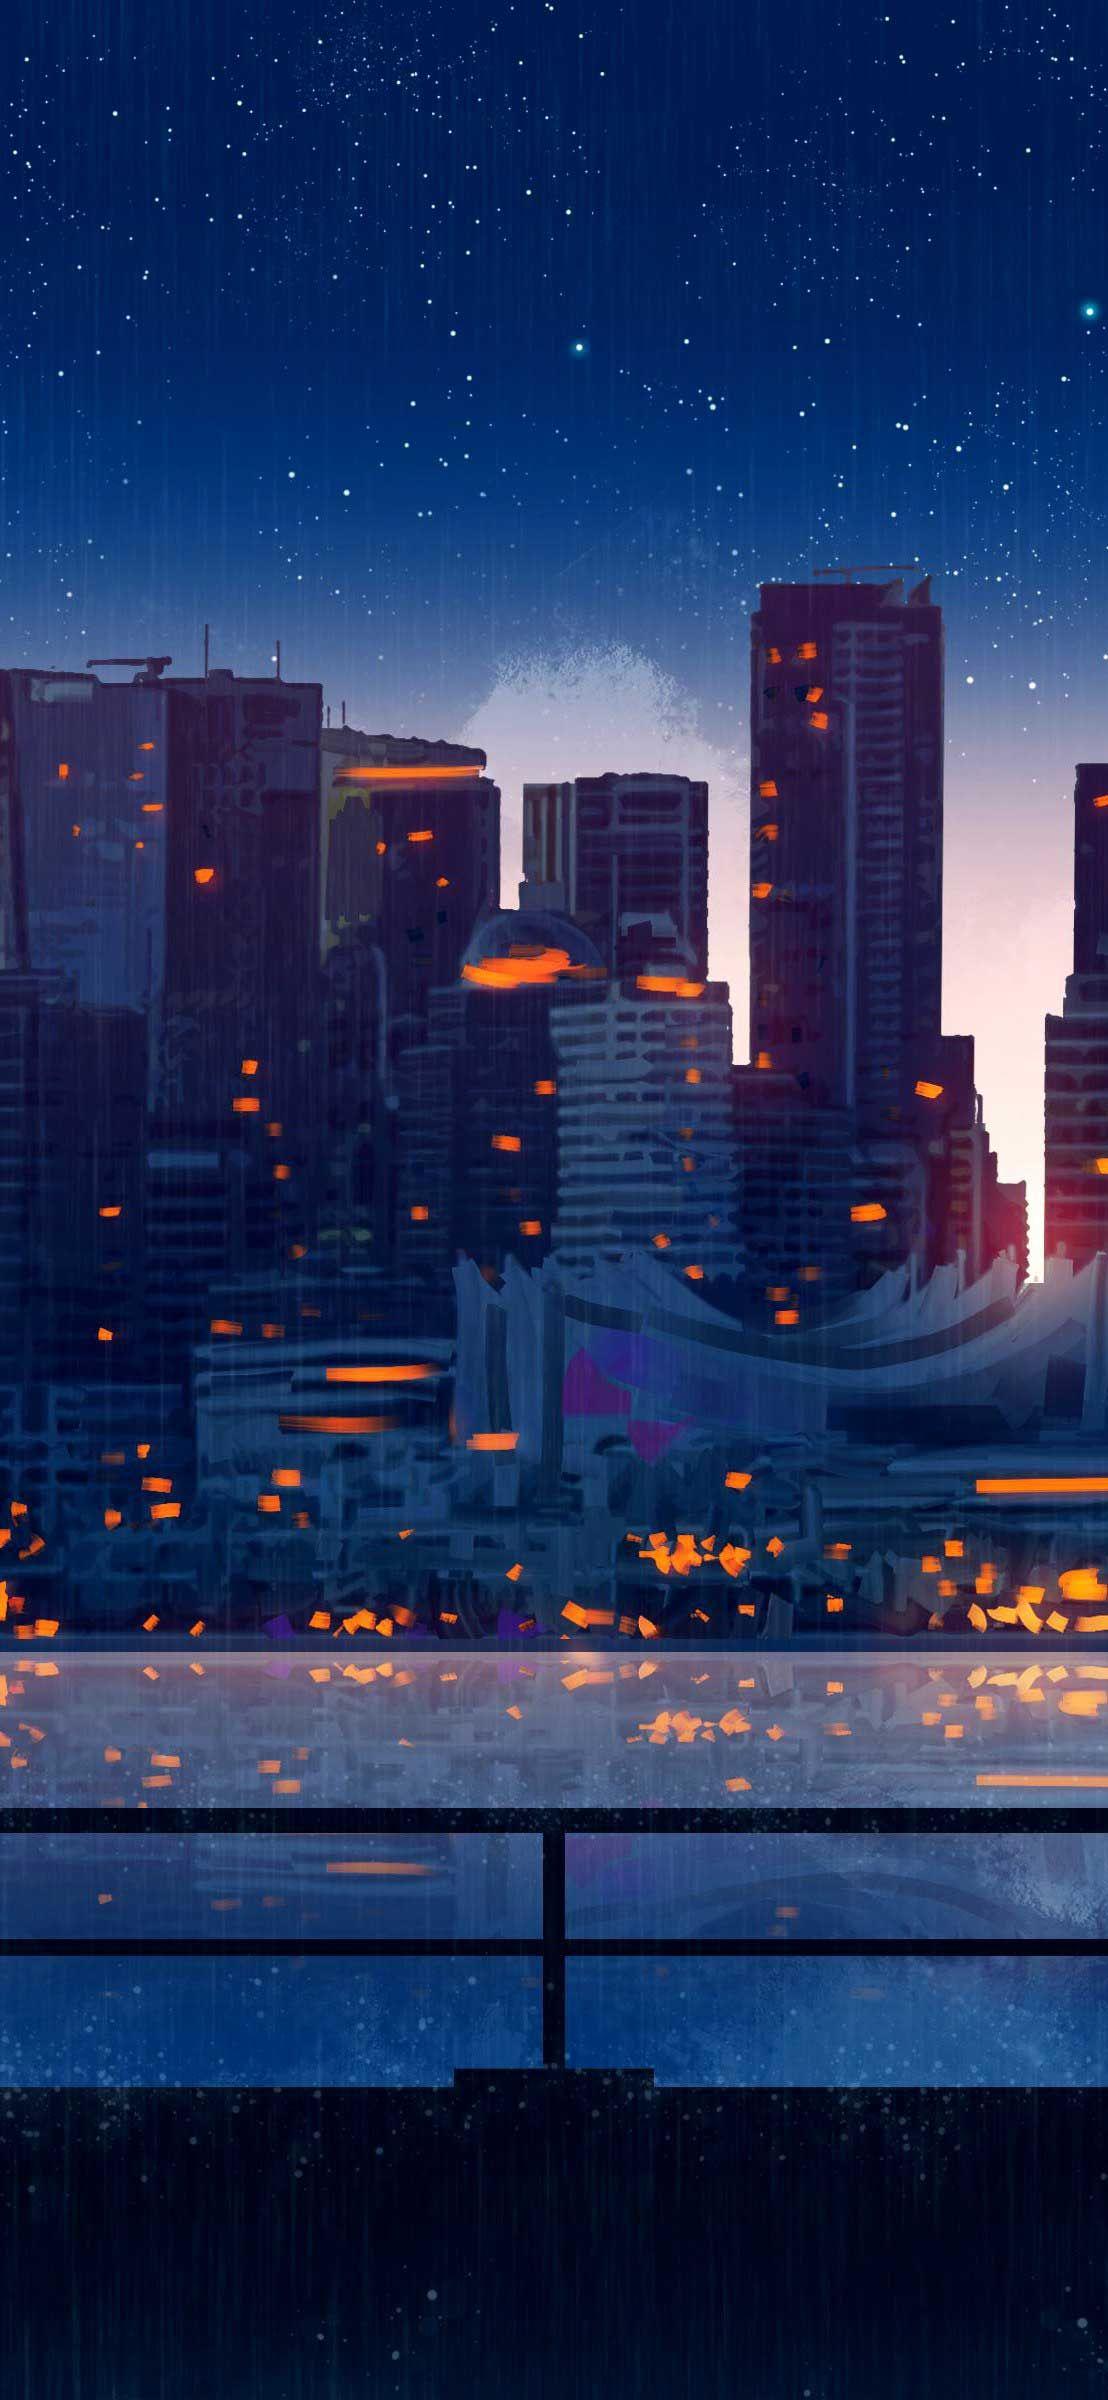 Anime City Lights Night Rain Umbrella Sky K Ou Iphone Pro Ma Wallpaper City Lights Wallpaper Anime City Night Rain Anime city iphone wallpaper